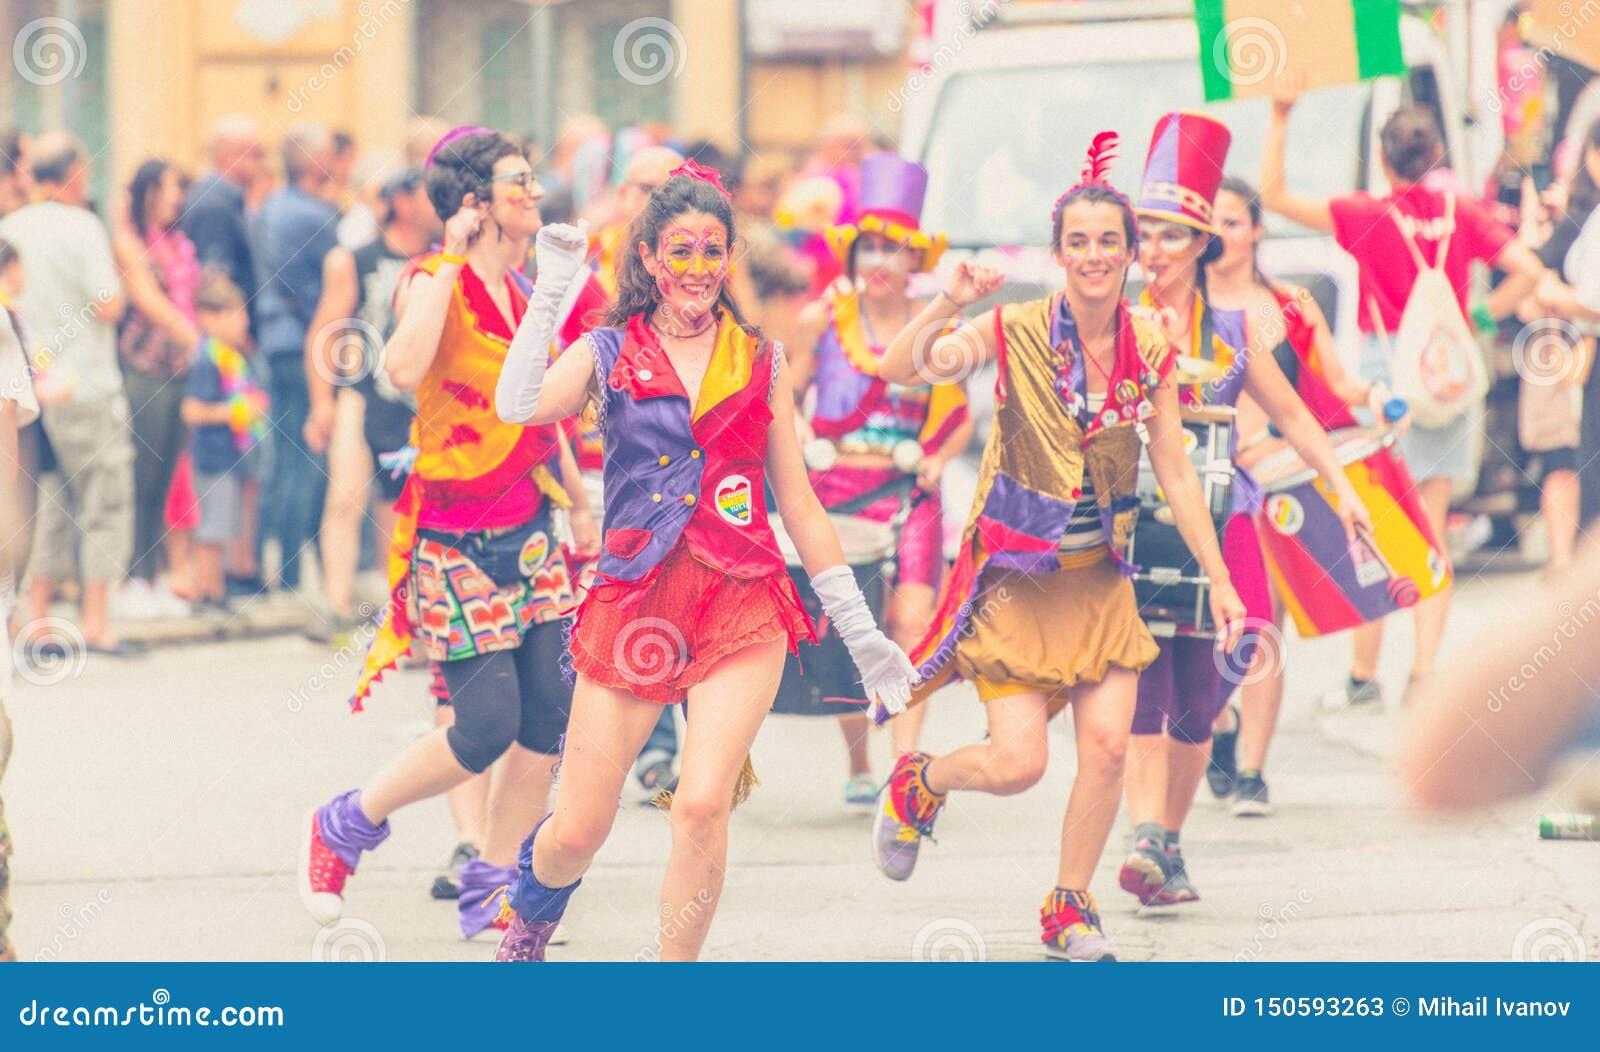 Genova Pride Parade 2019